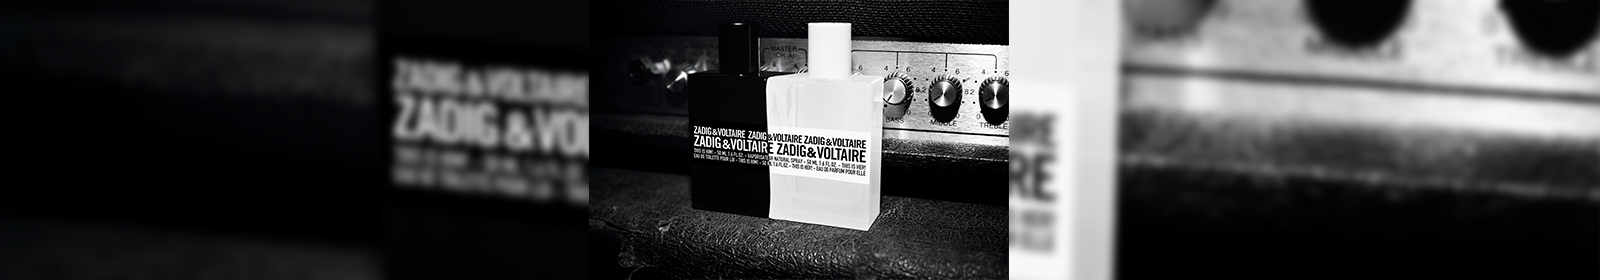 cosmetice/parfumuri zadig_voltaire